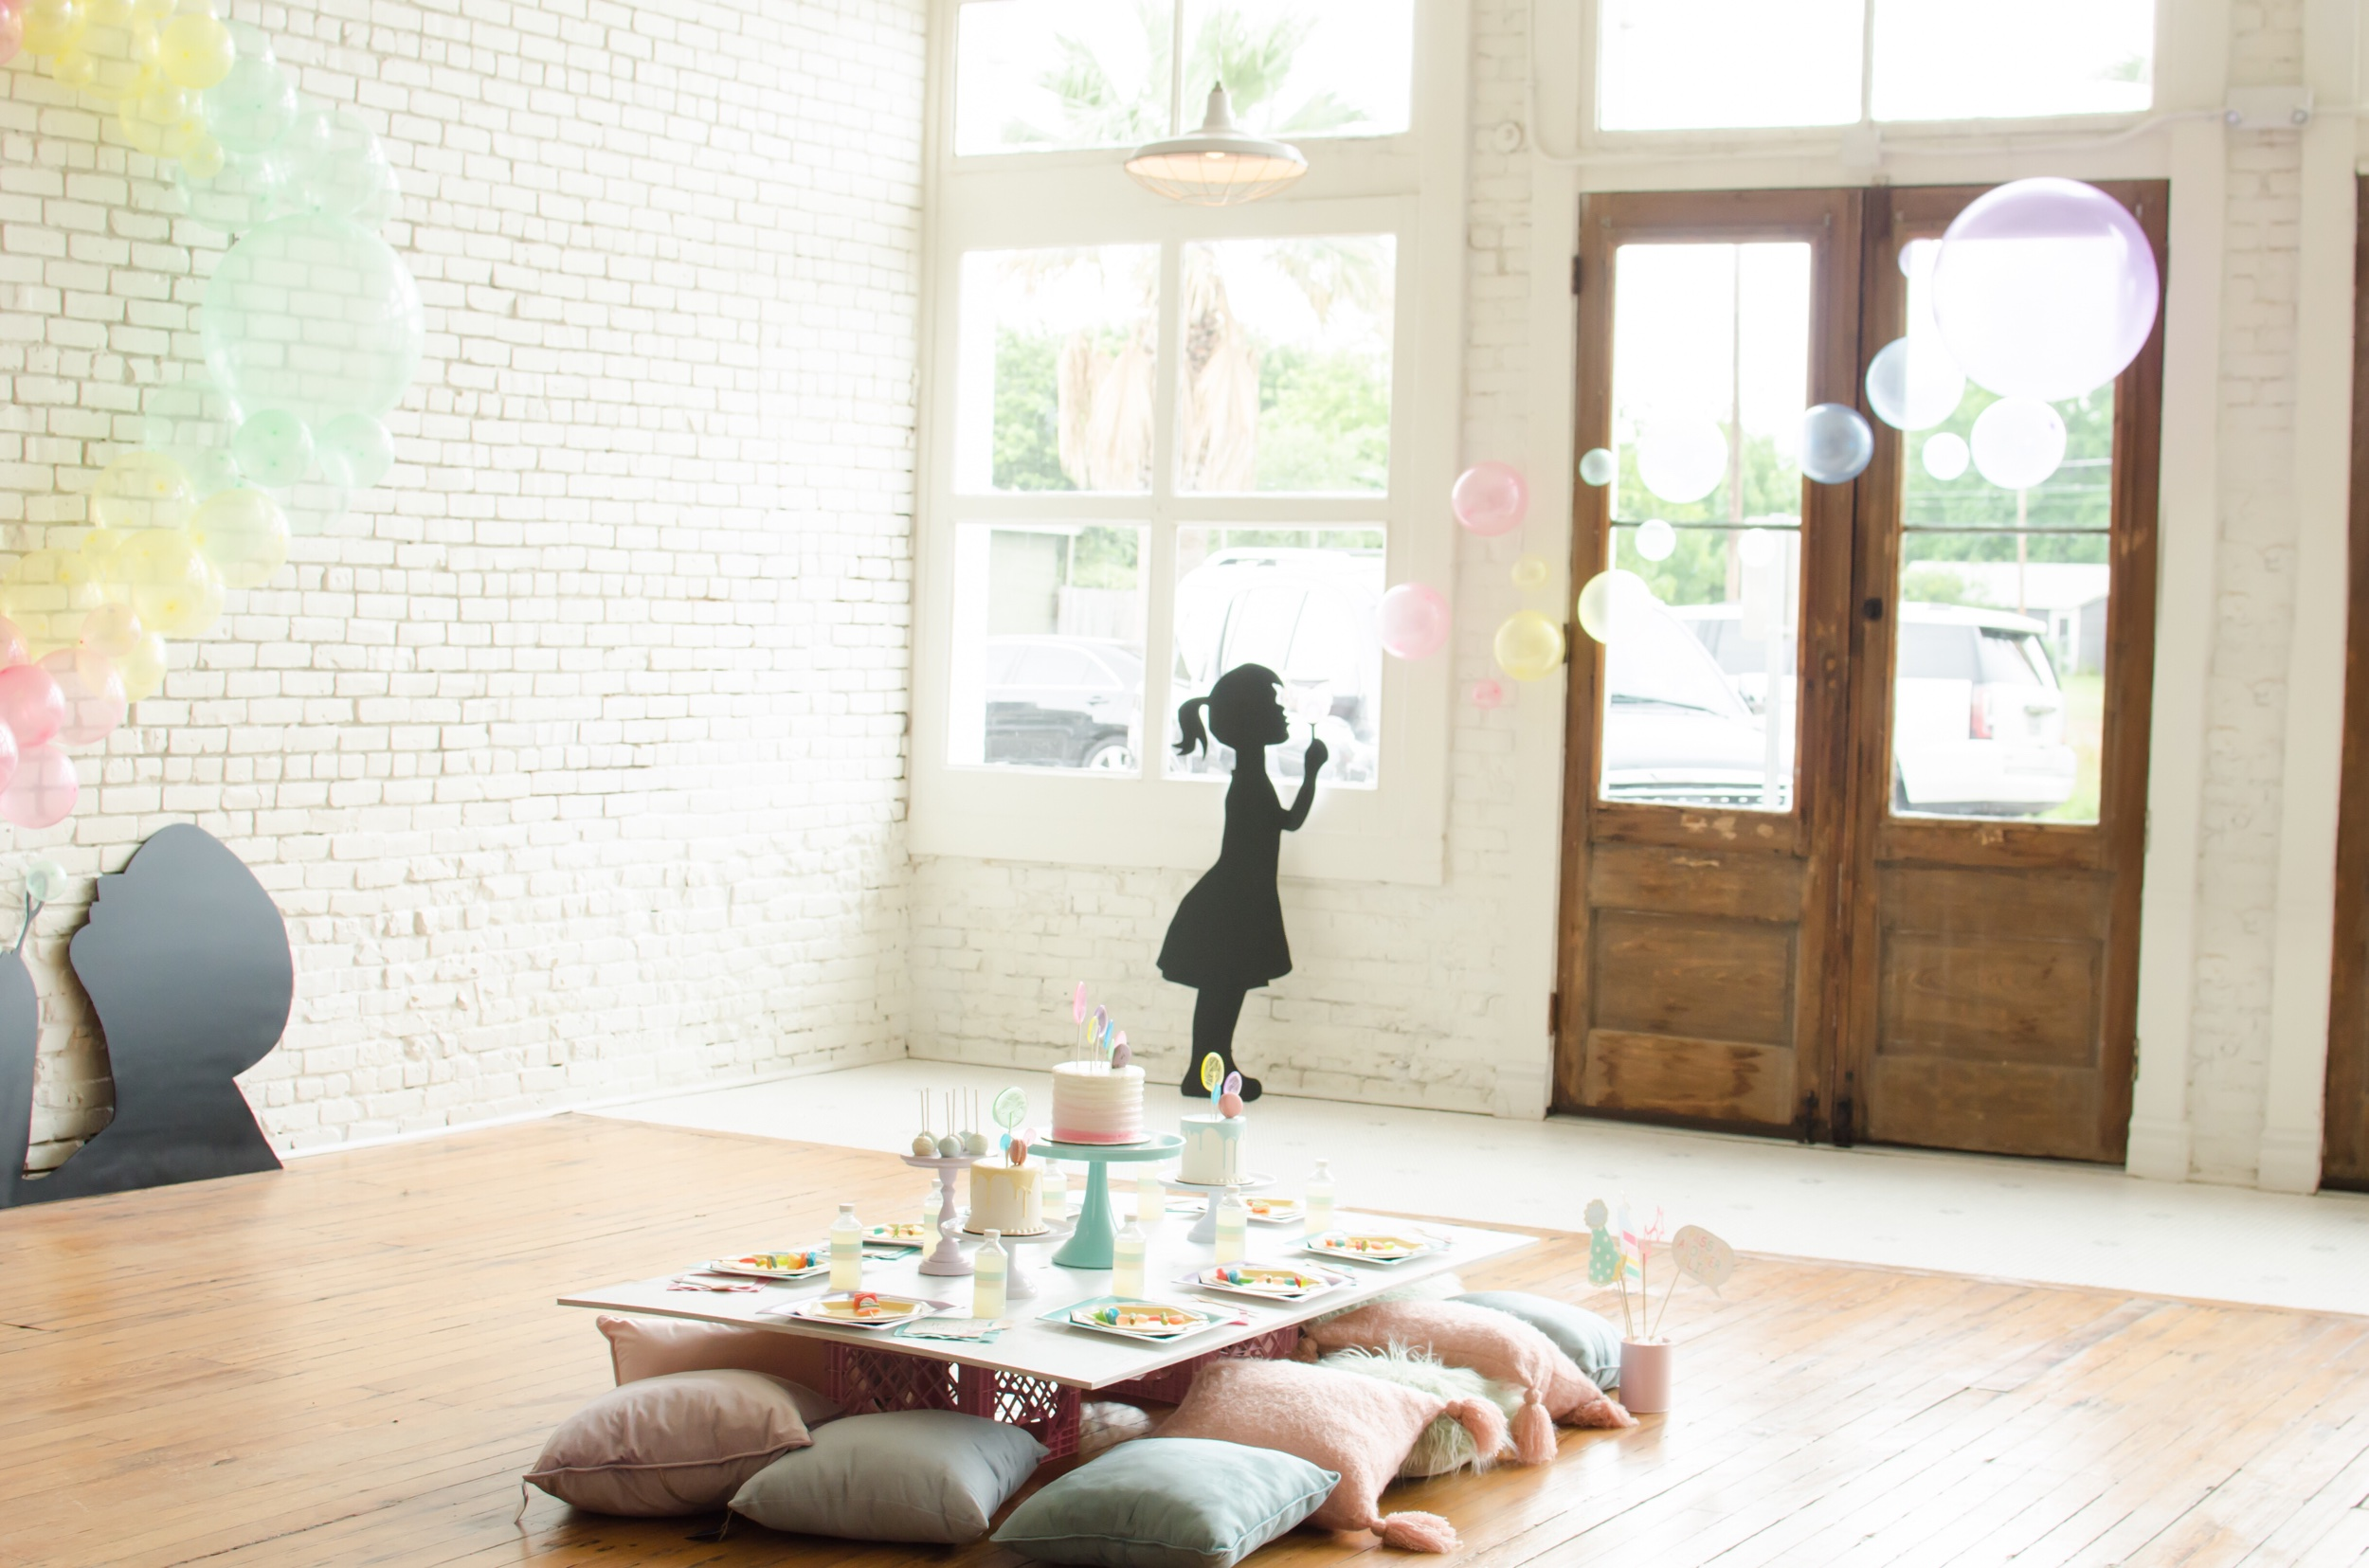 So cute! Girl blowing bubble balloon art!